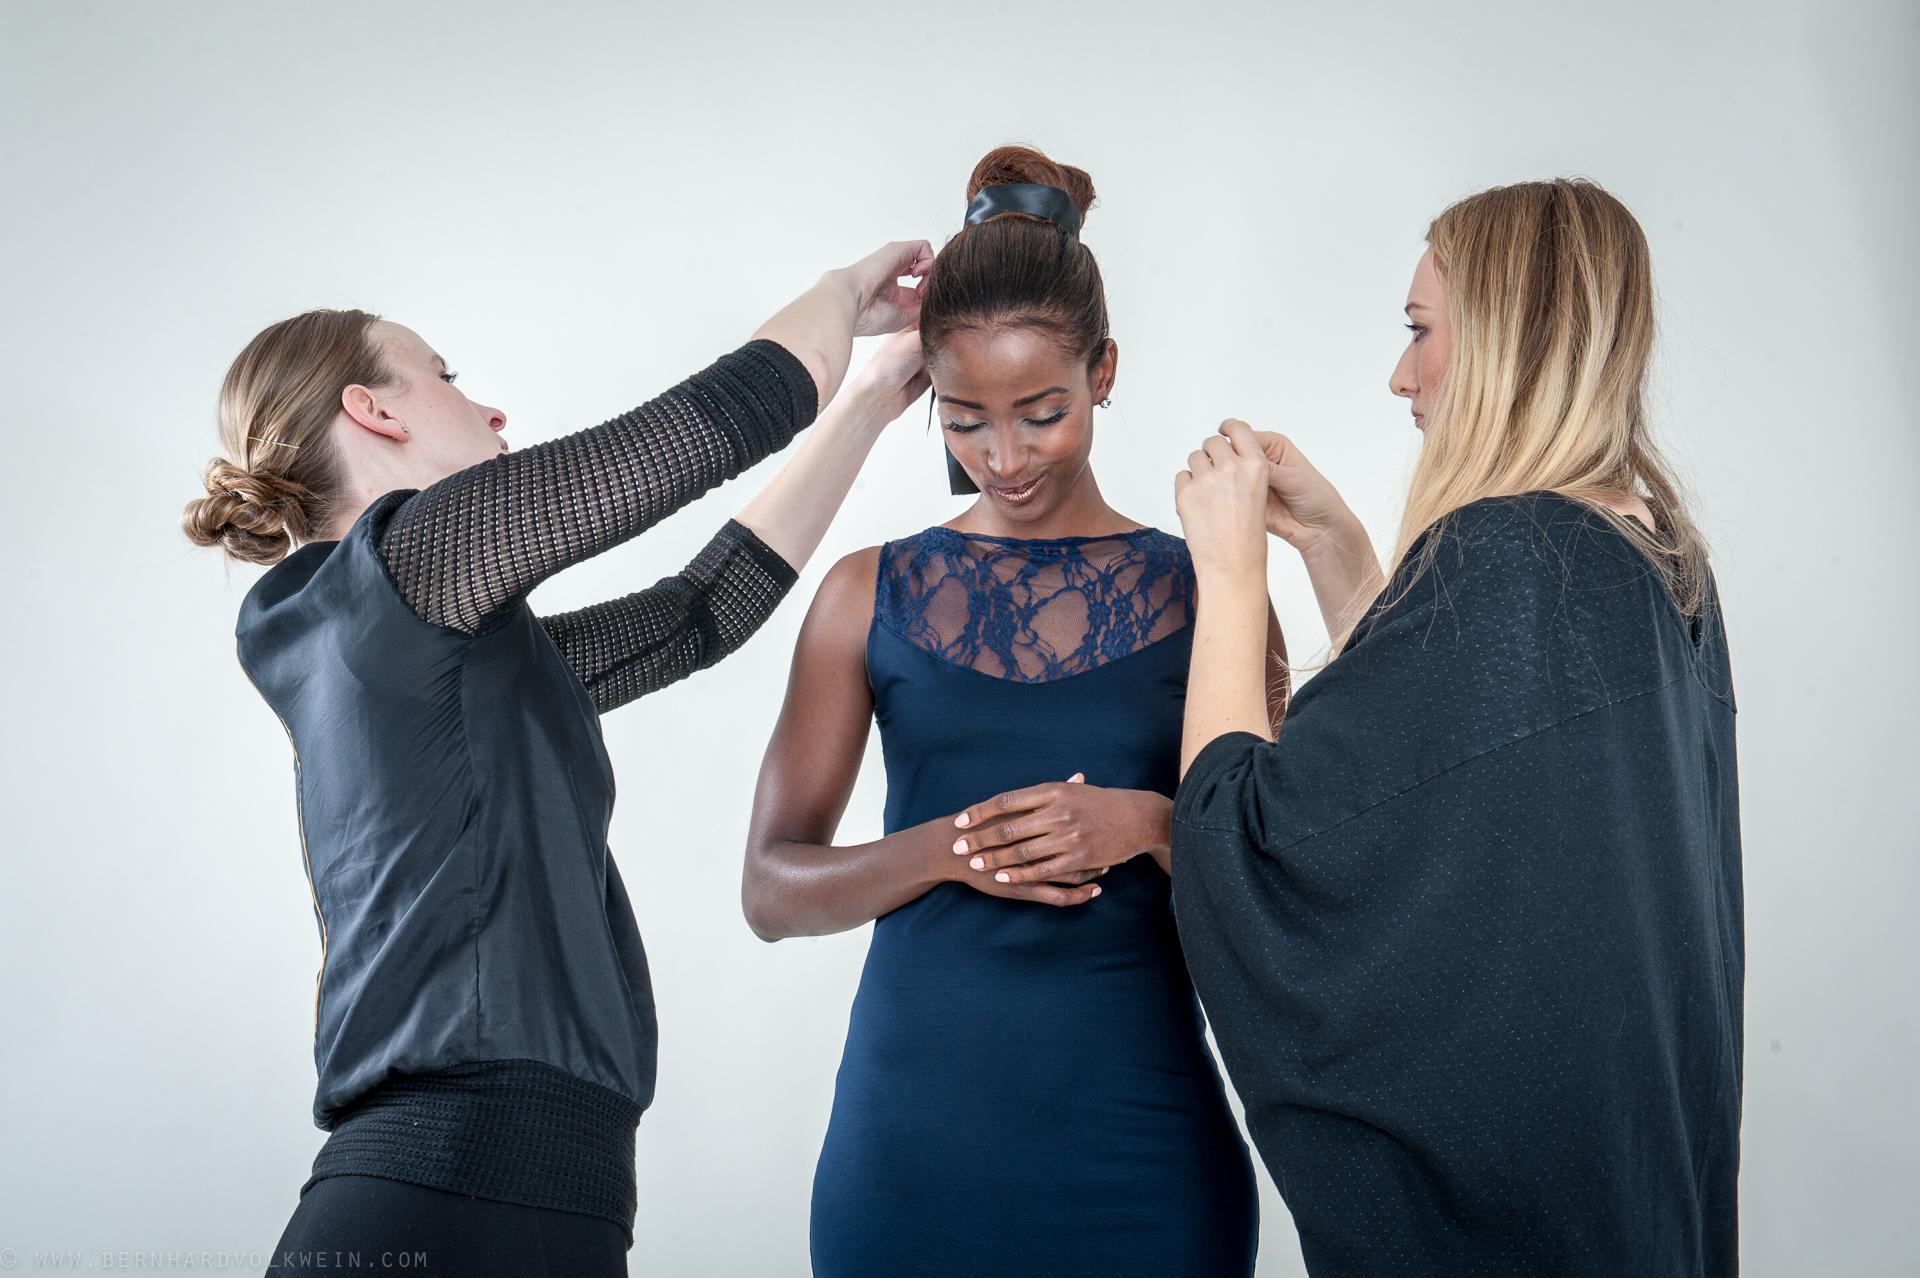 Fashion Shooting with Prussia Janna Lenartz & Monique Bredow